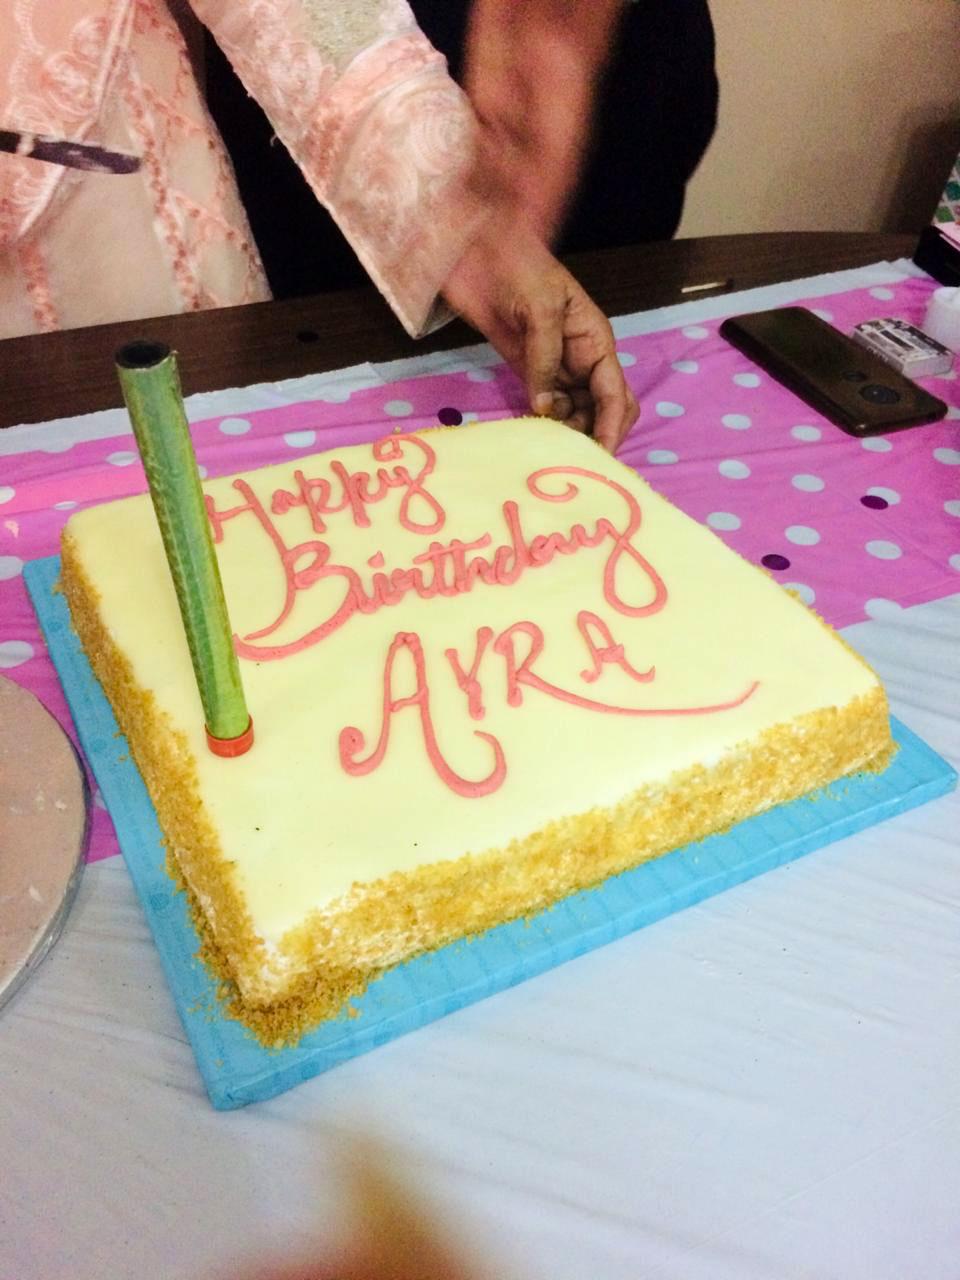 Ayra's second vanilla cake.